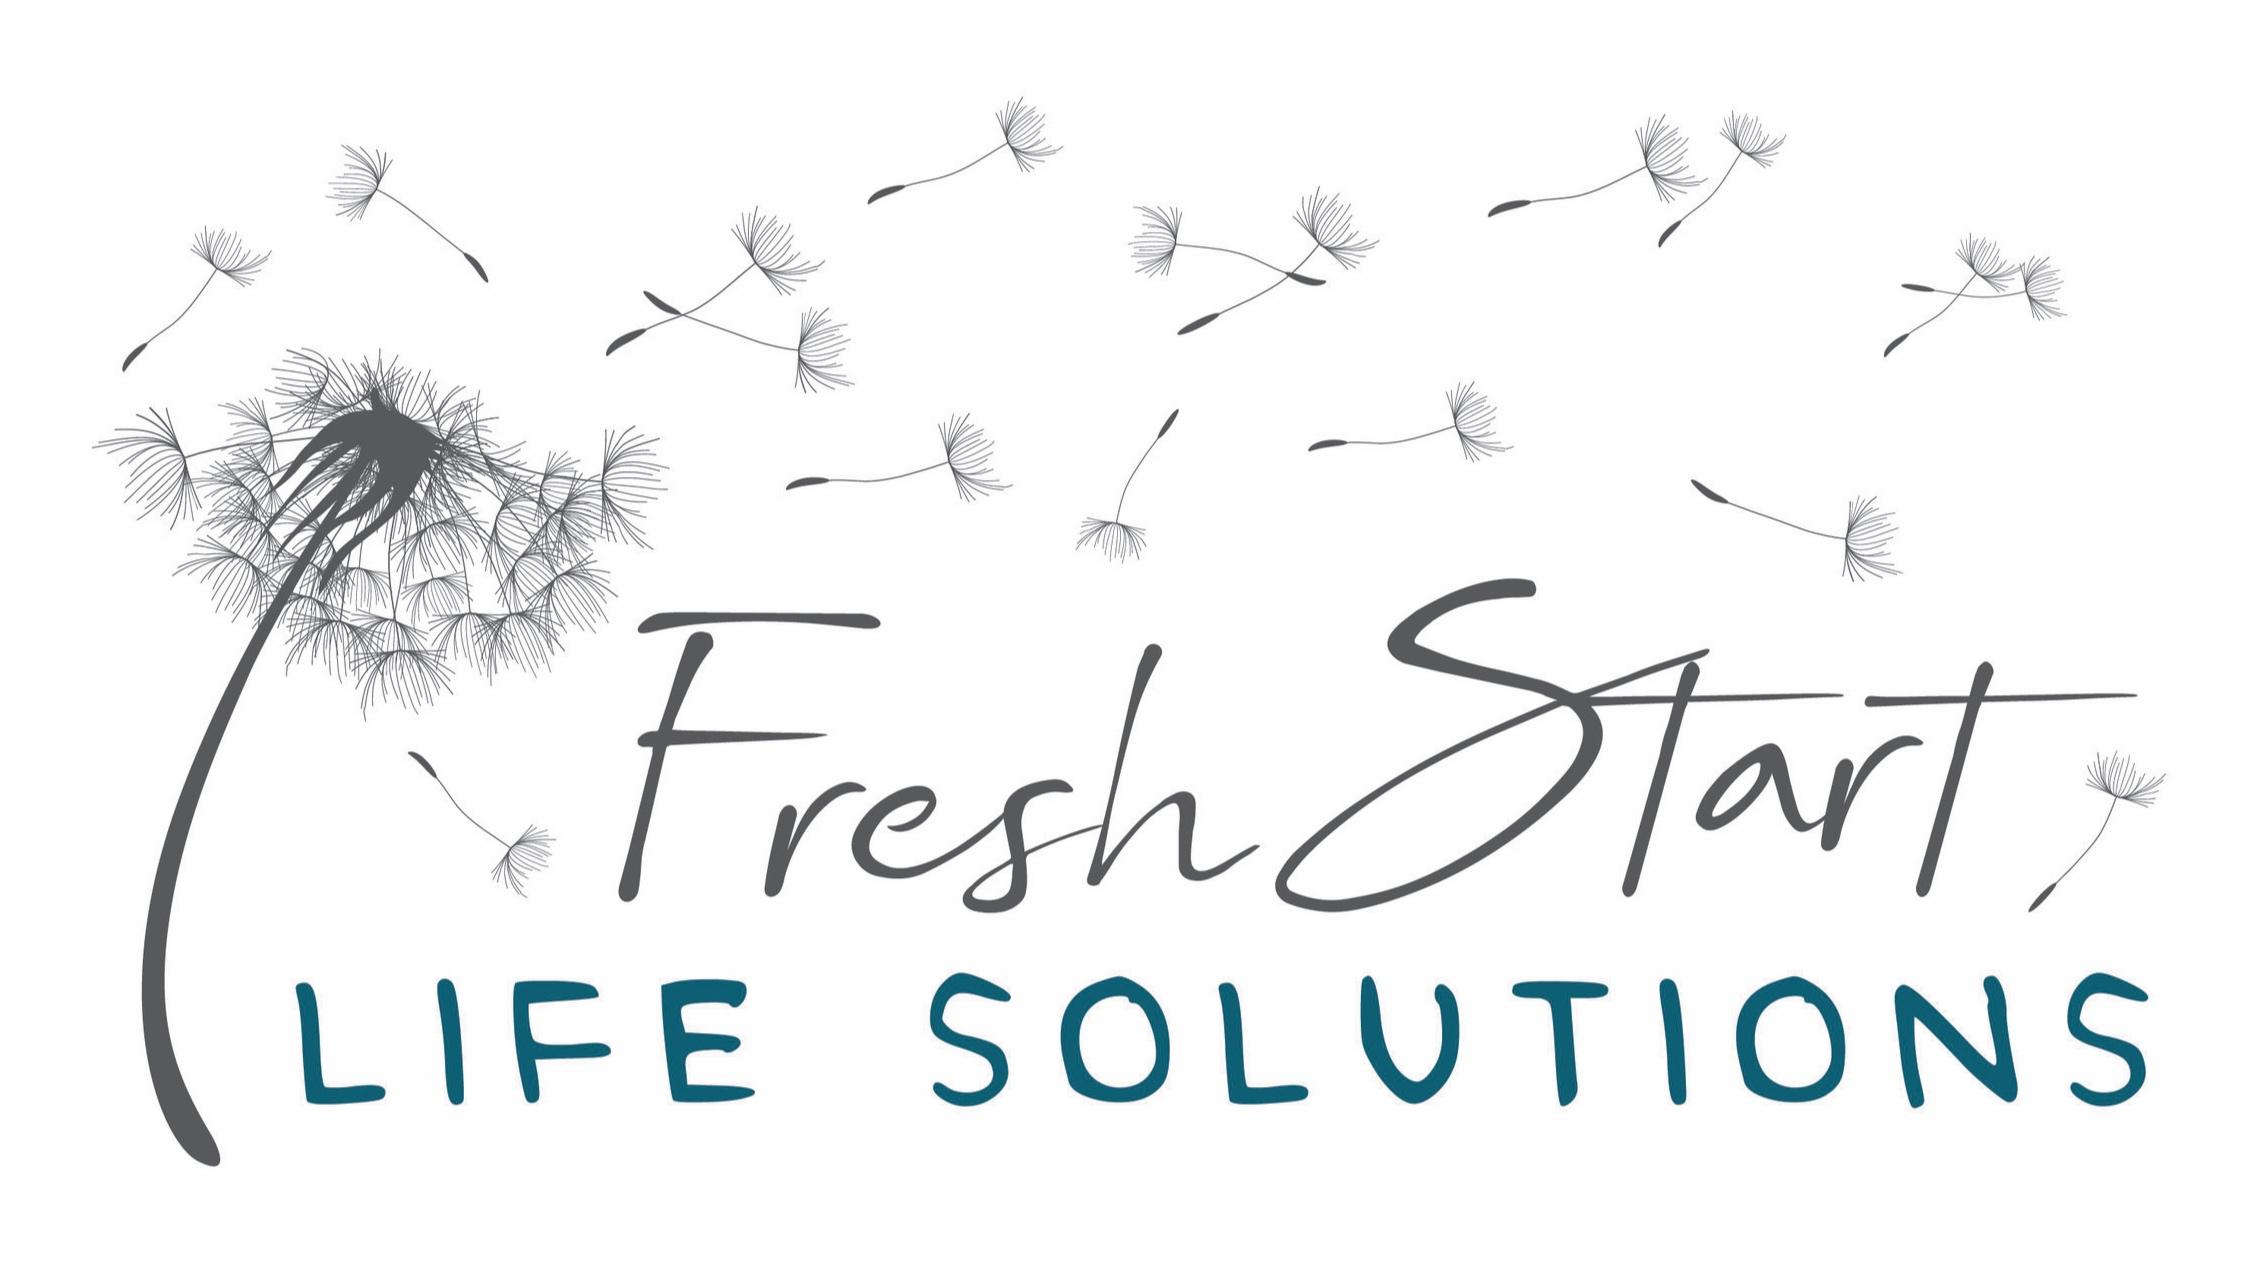 FreshStartLifeSolutions_Color.jpg